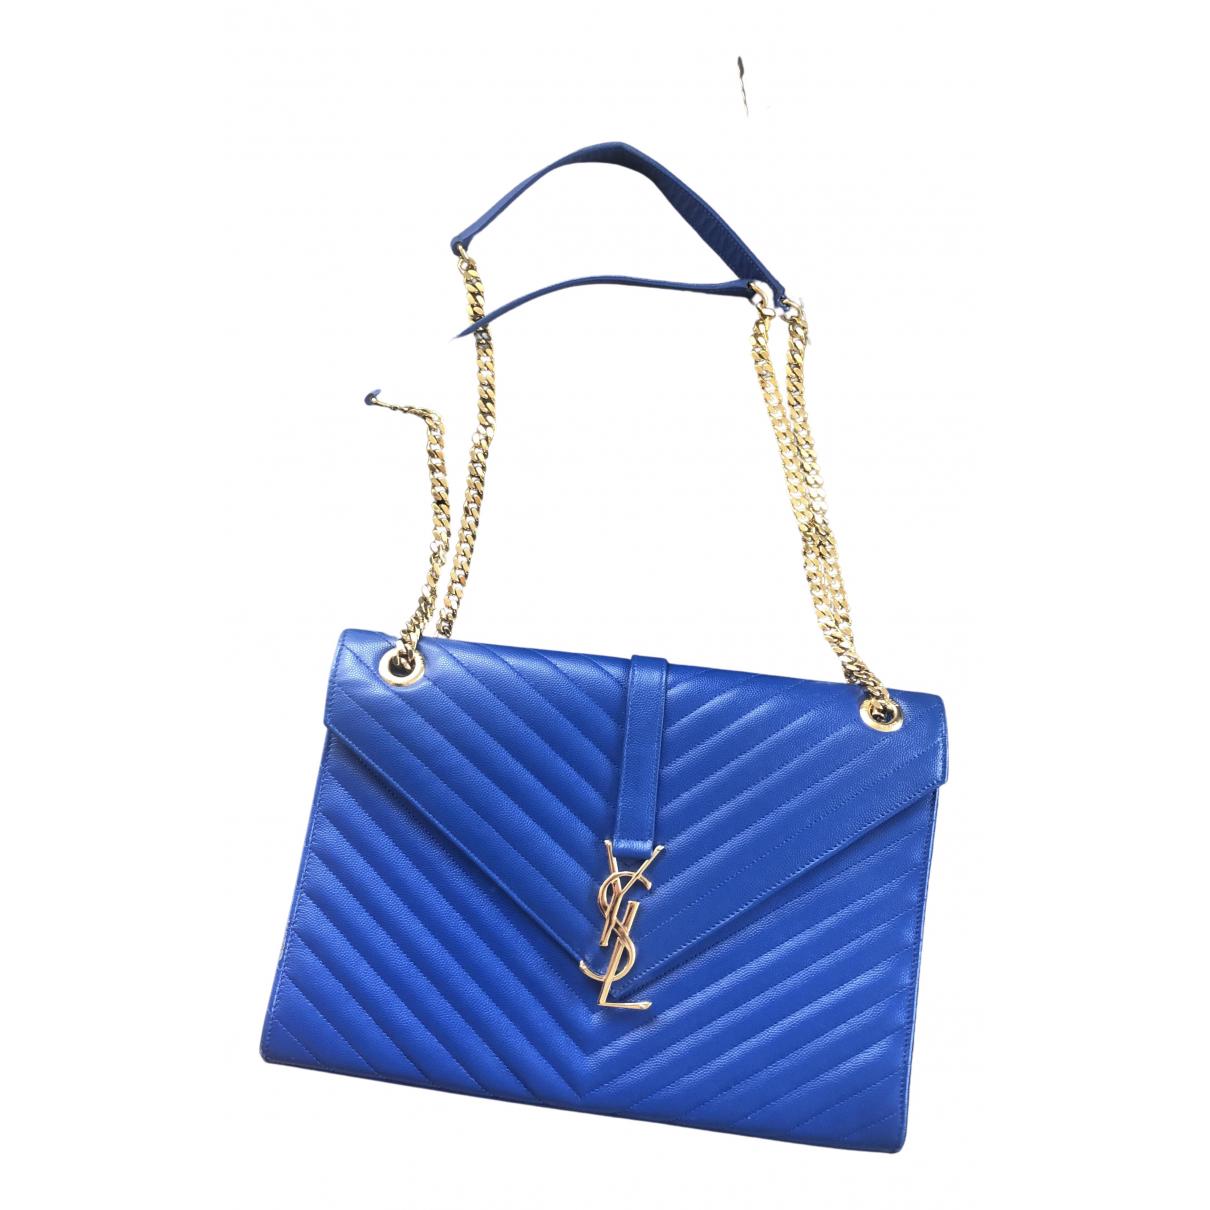 Saint Laurent Satchel monogramme Blue Leather handbag for Women N